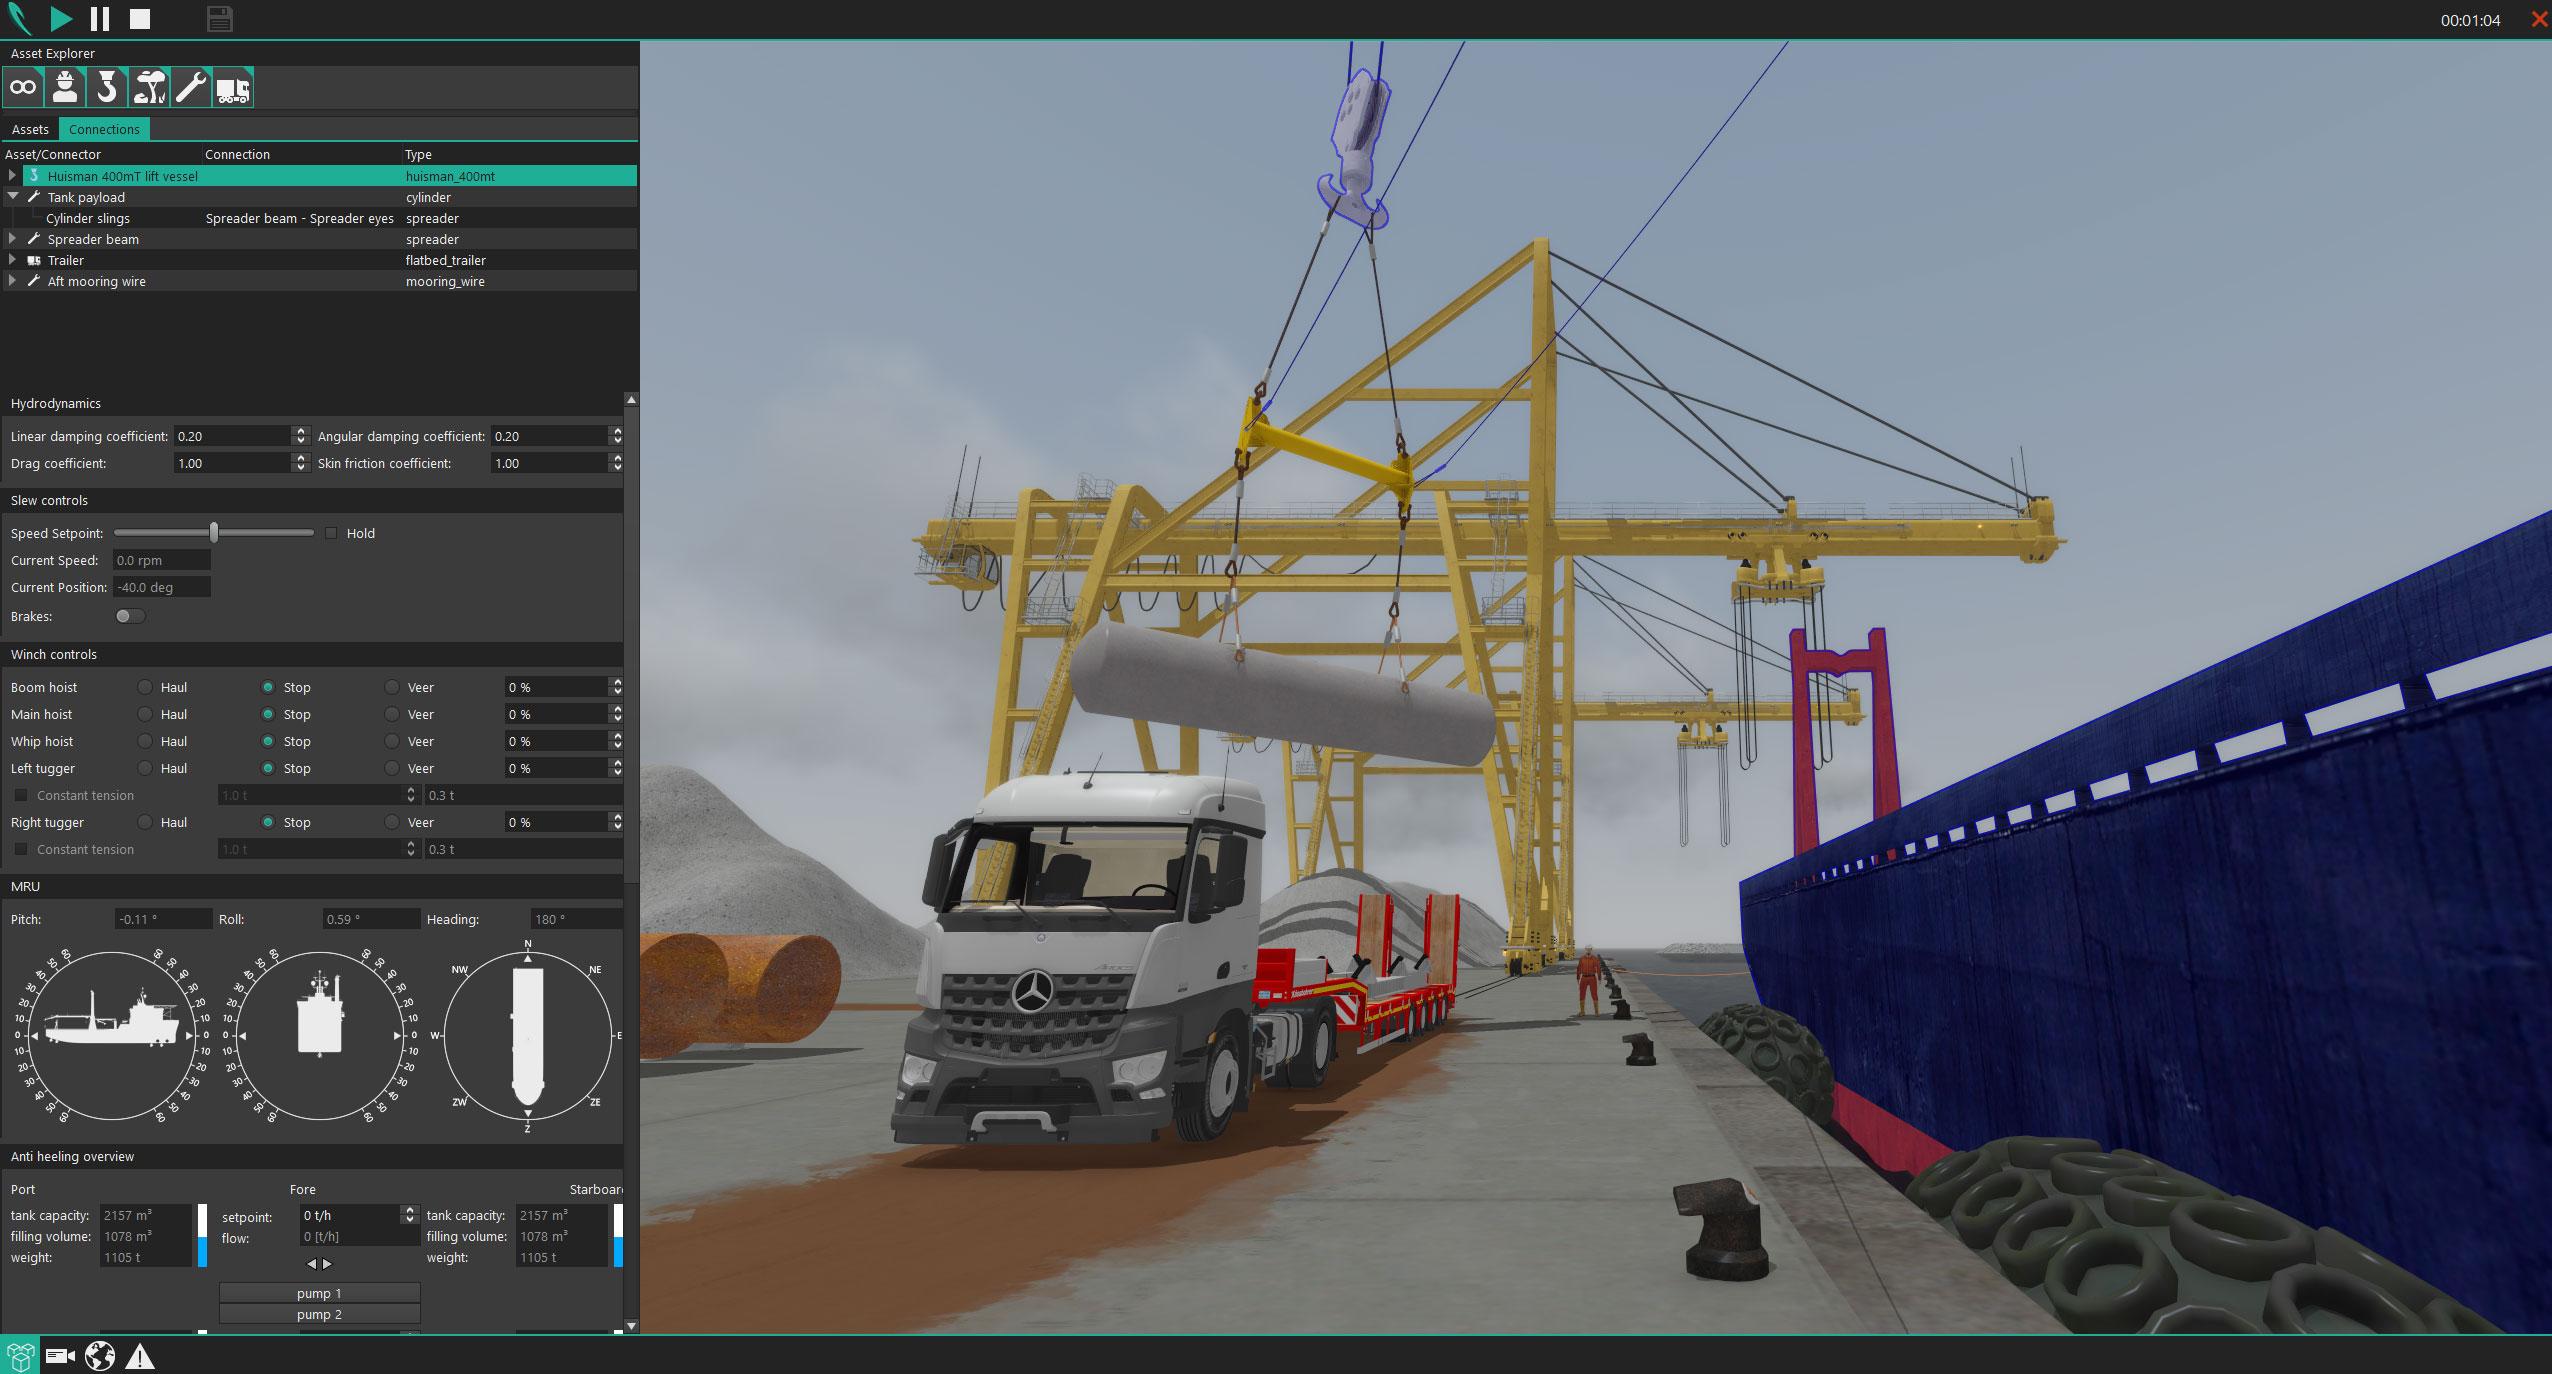 vr4max asset simulator interface